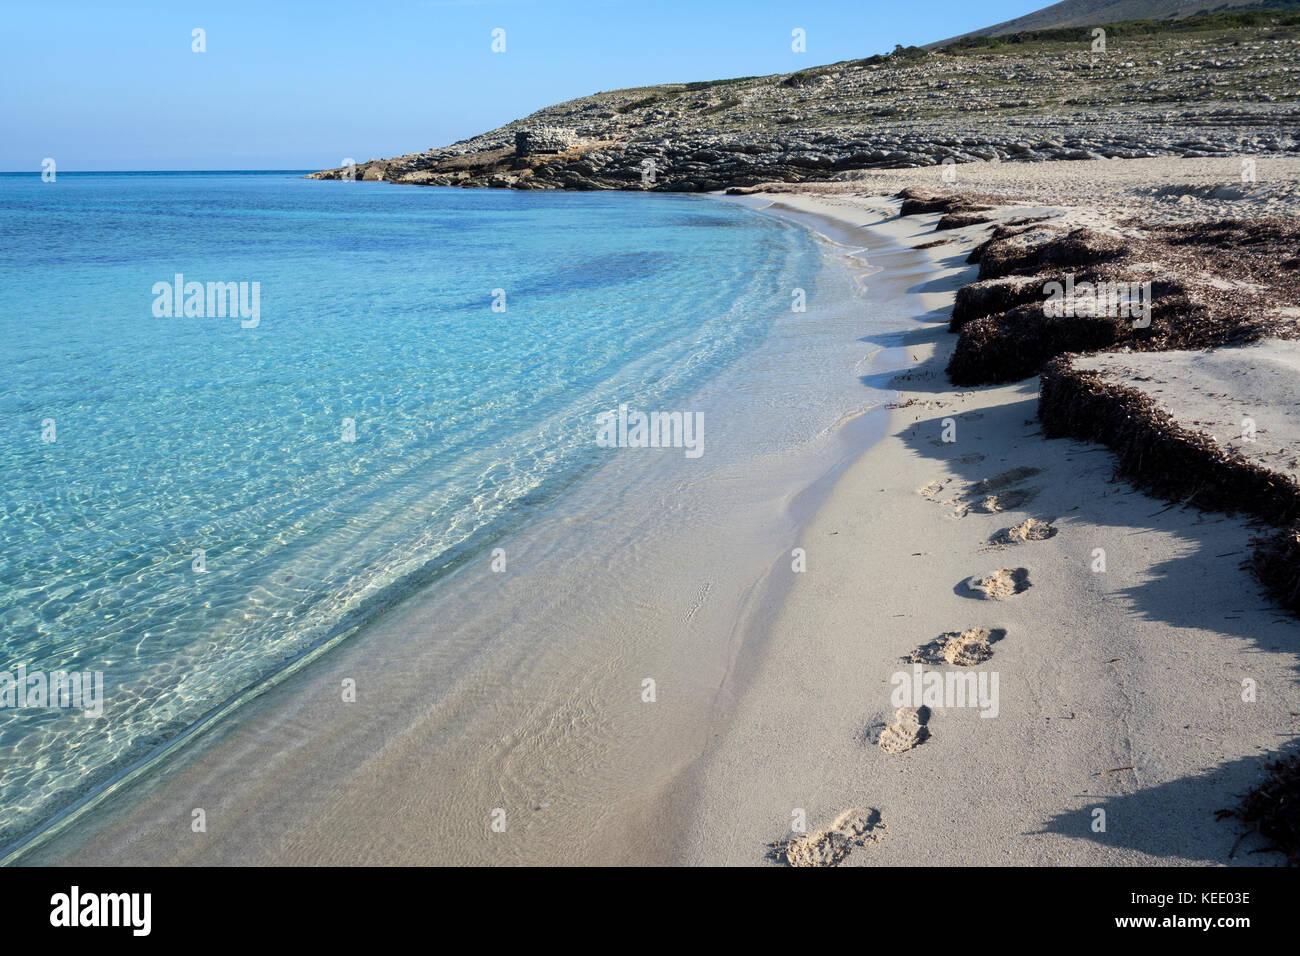 Cala Mesquida beach,Mallorca Island.Spain - Stock Image